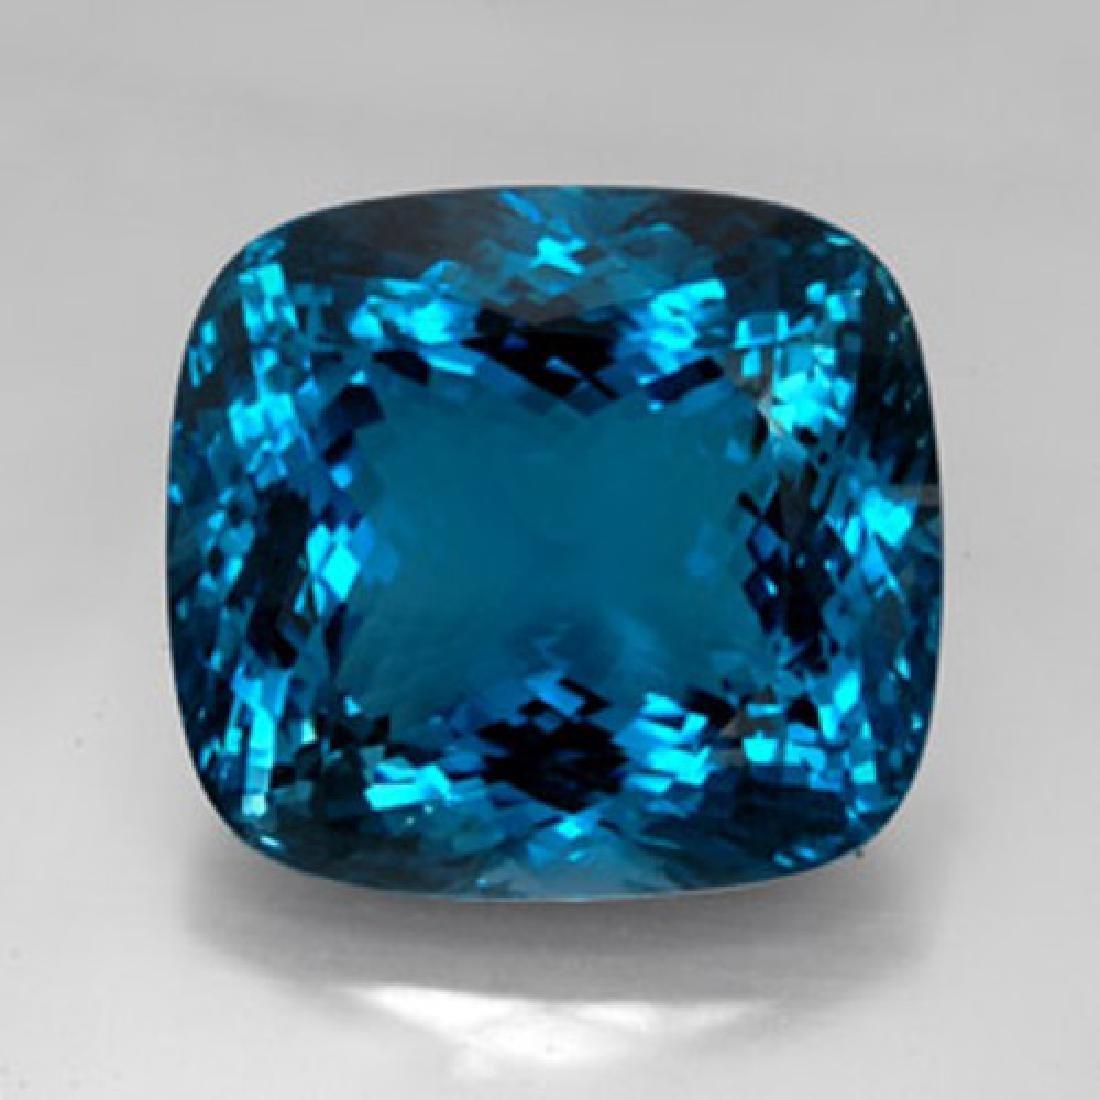 Natural London Blue Topaz 33.25 carats - VVS